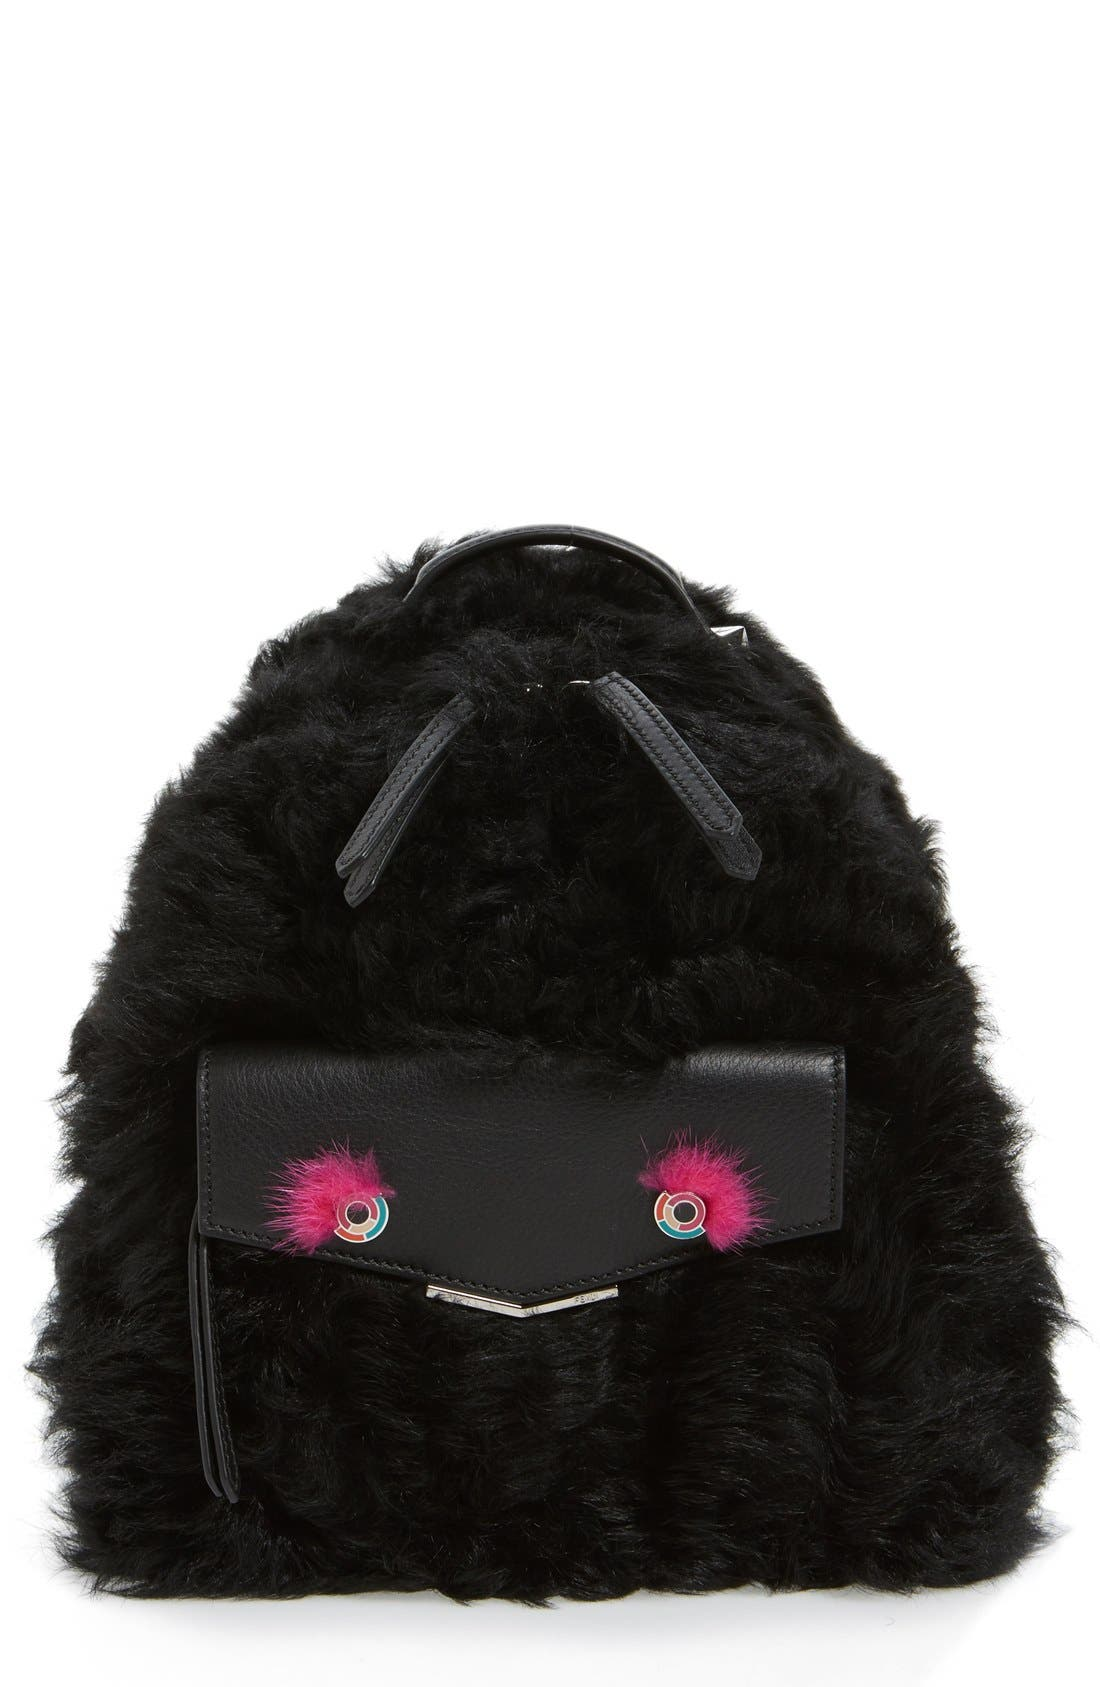 Alternate Image 1 Selected - Fendi 'Mini Monster' Genuine Shearling & Genuine Mink Fur Backpack